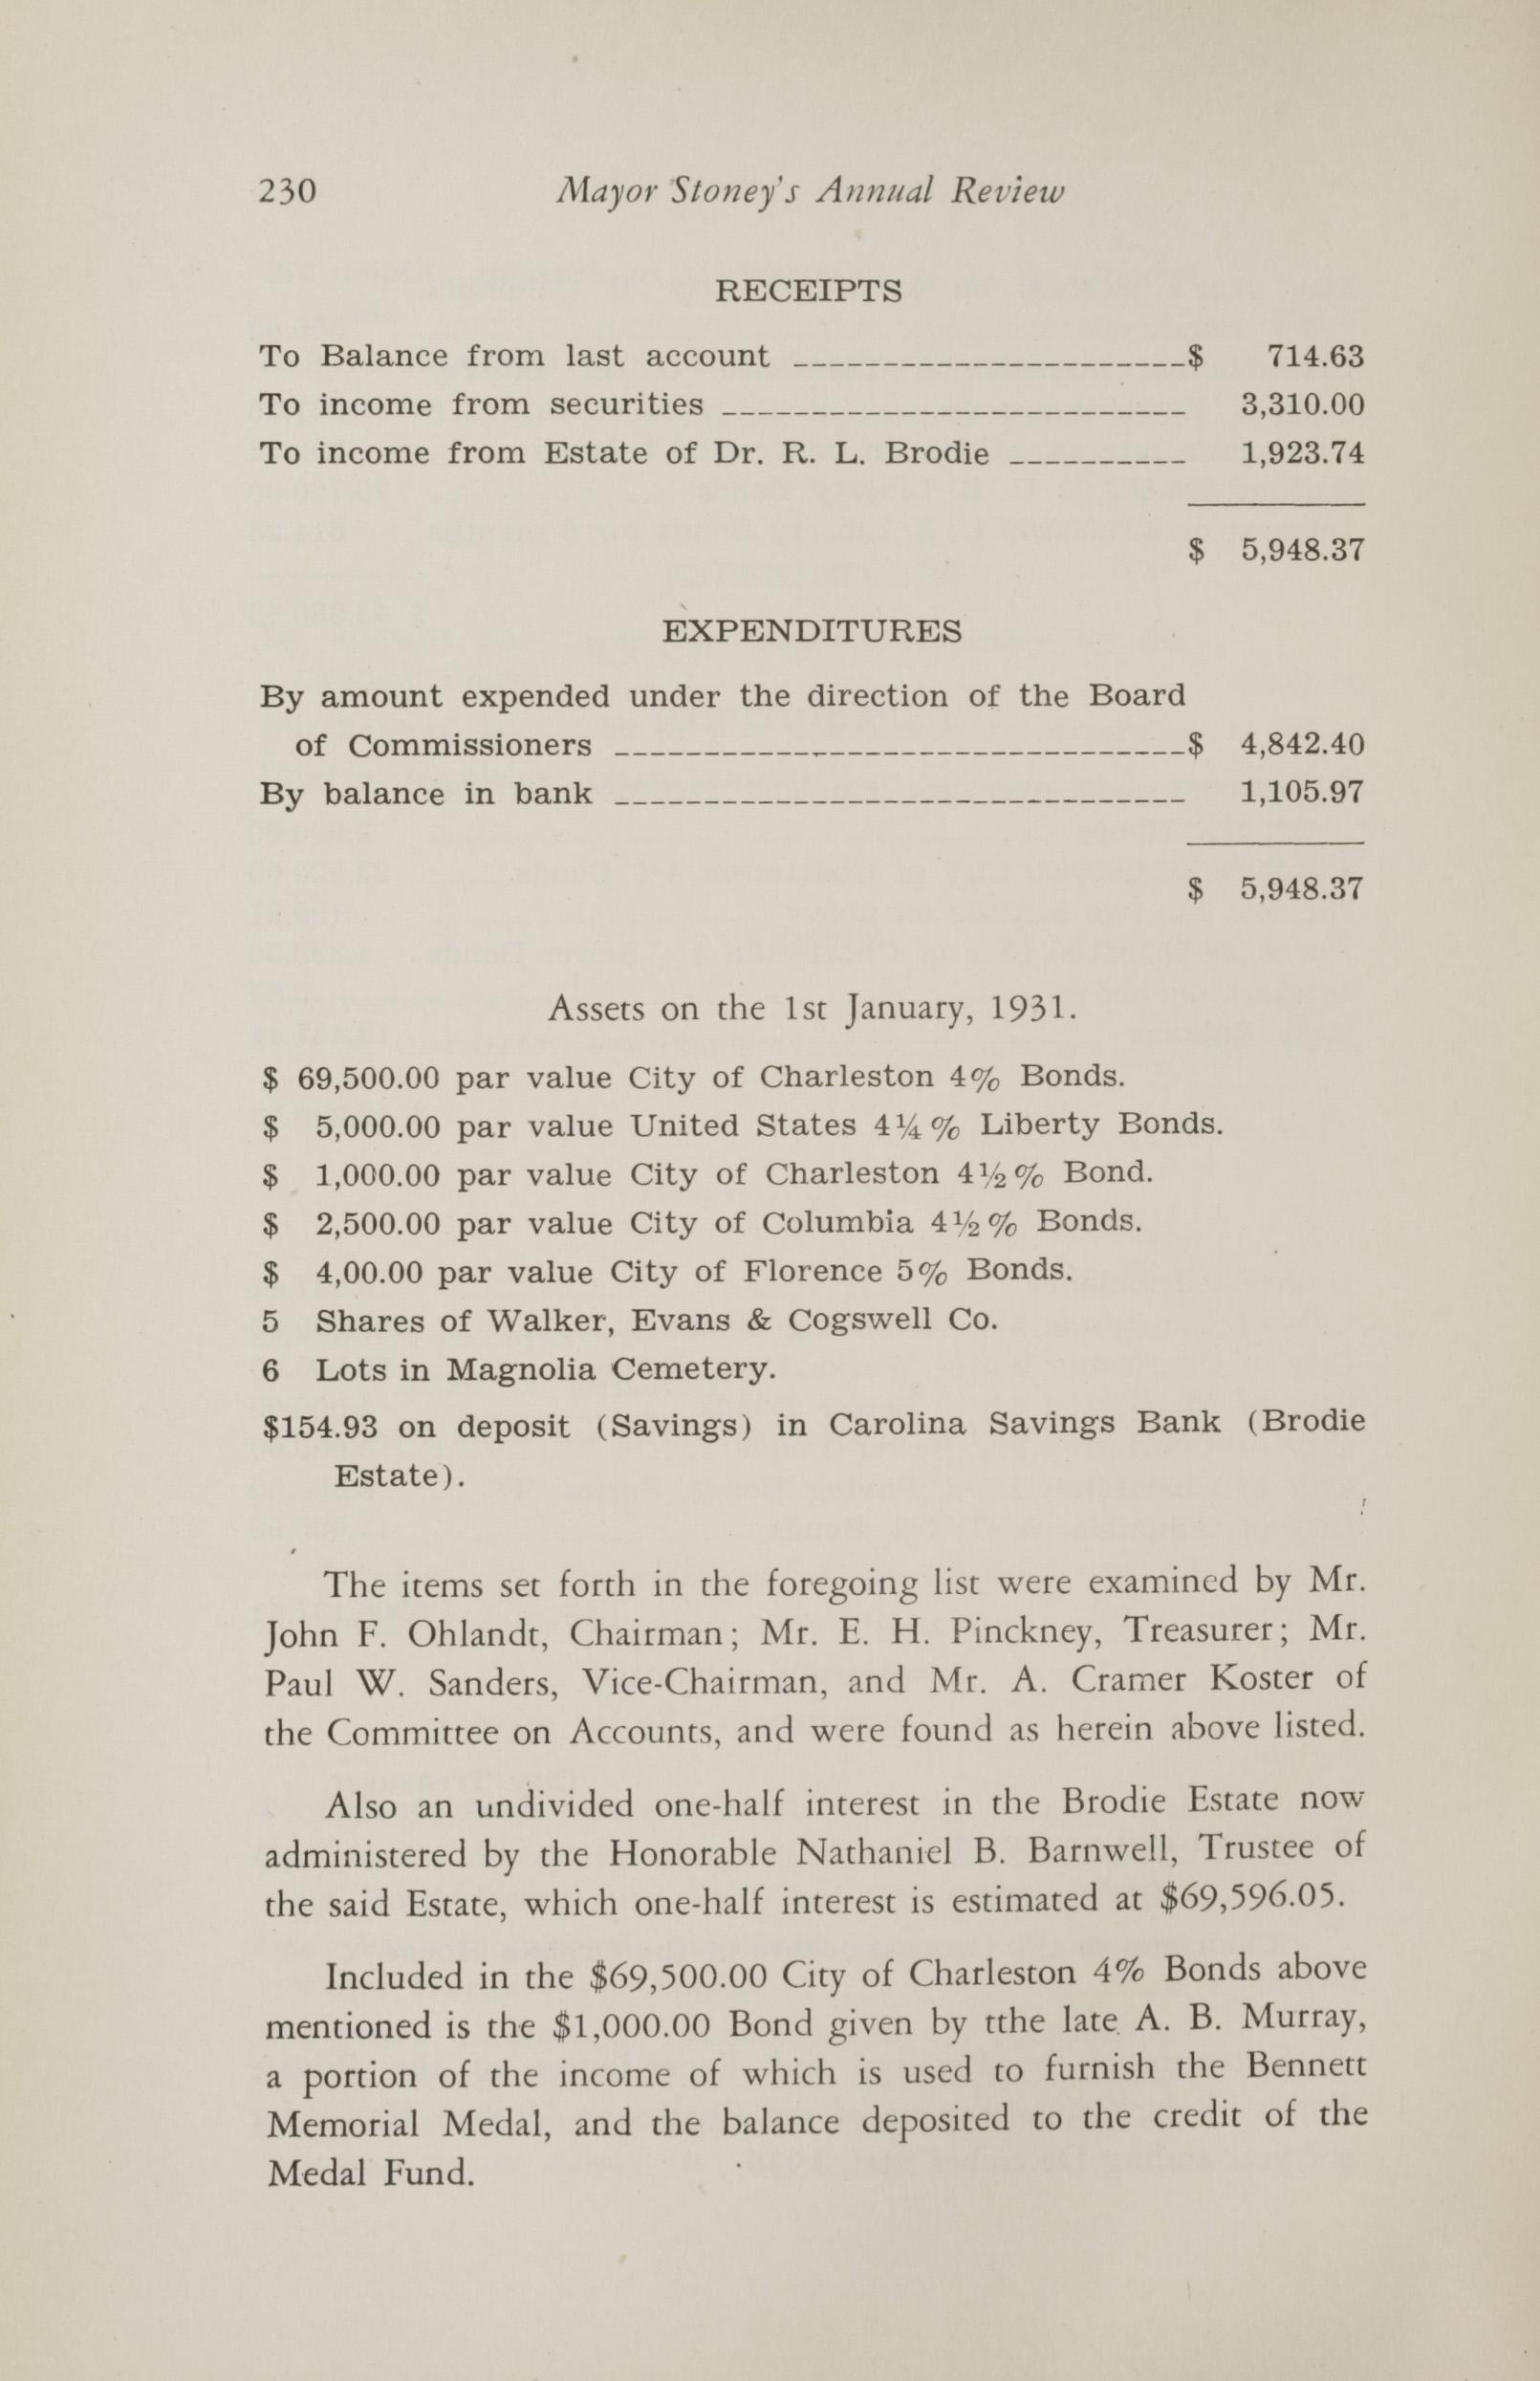 Charleston Yearbook, 1930, page 230